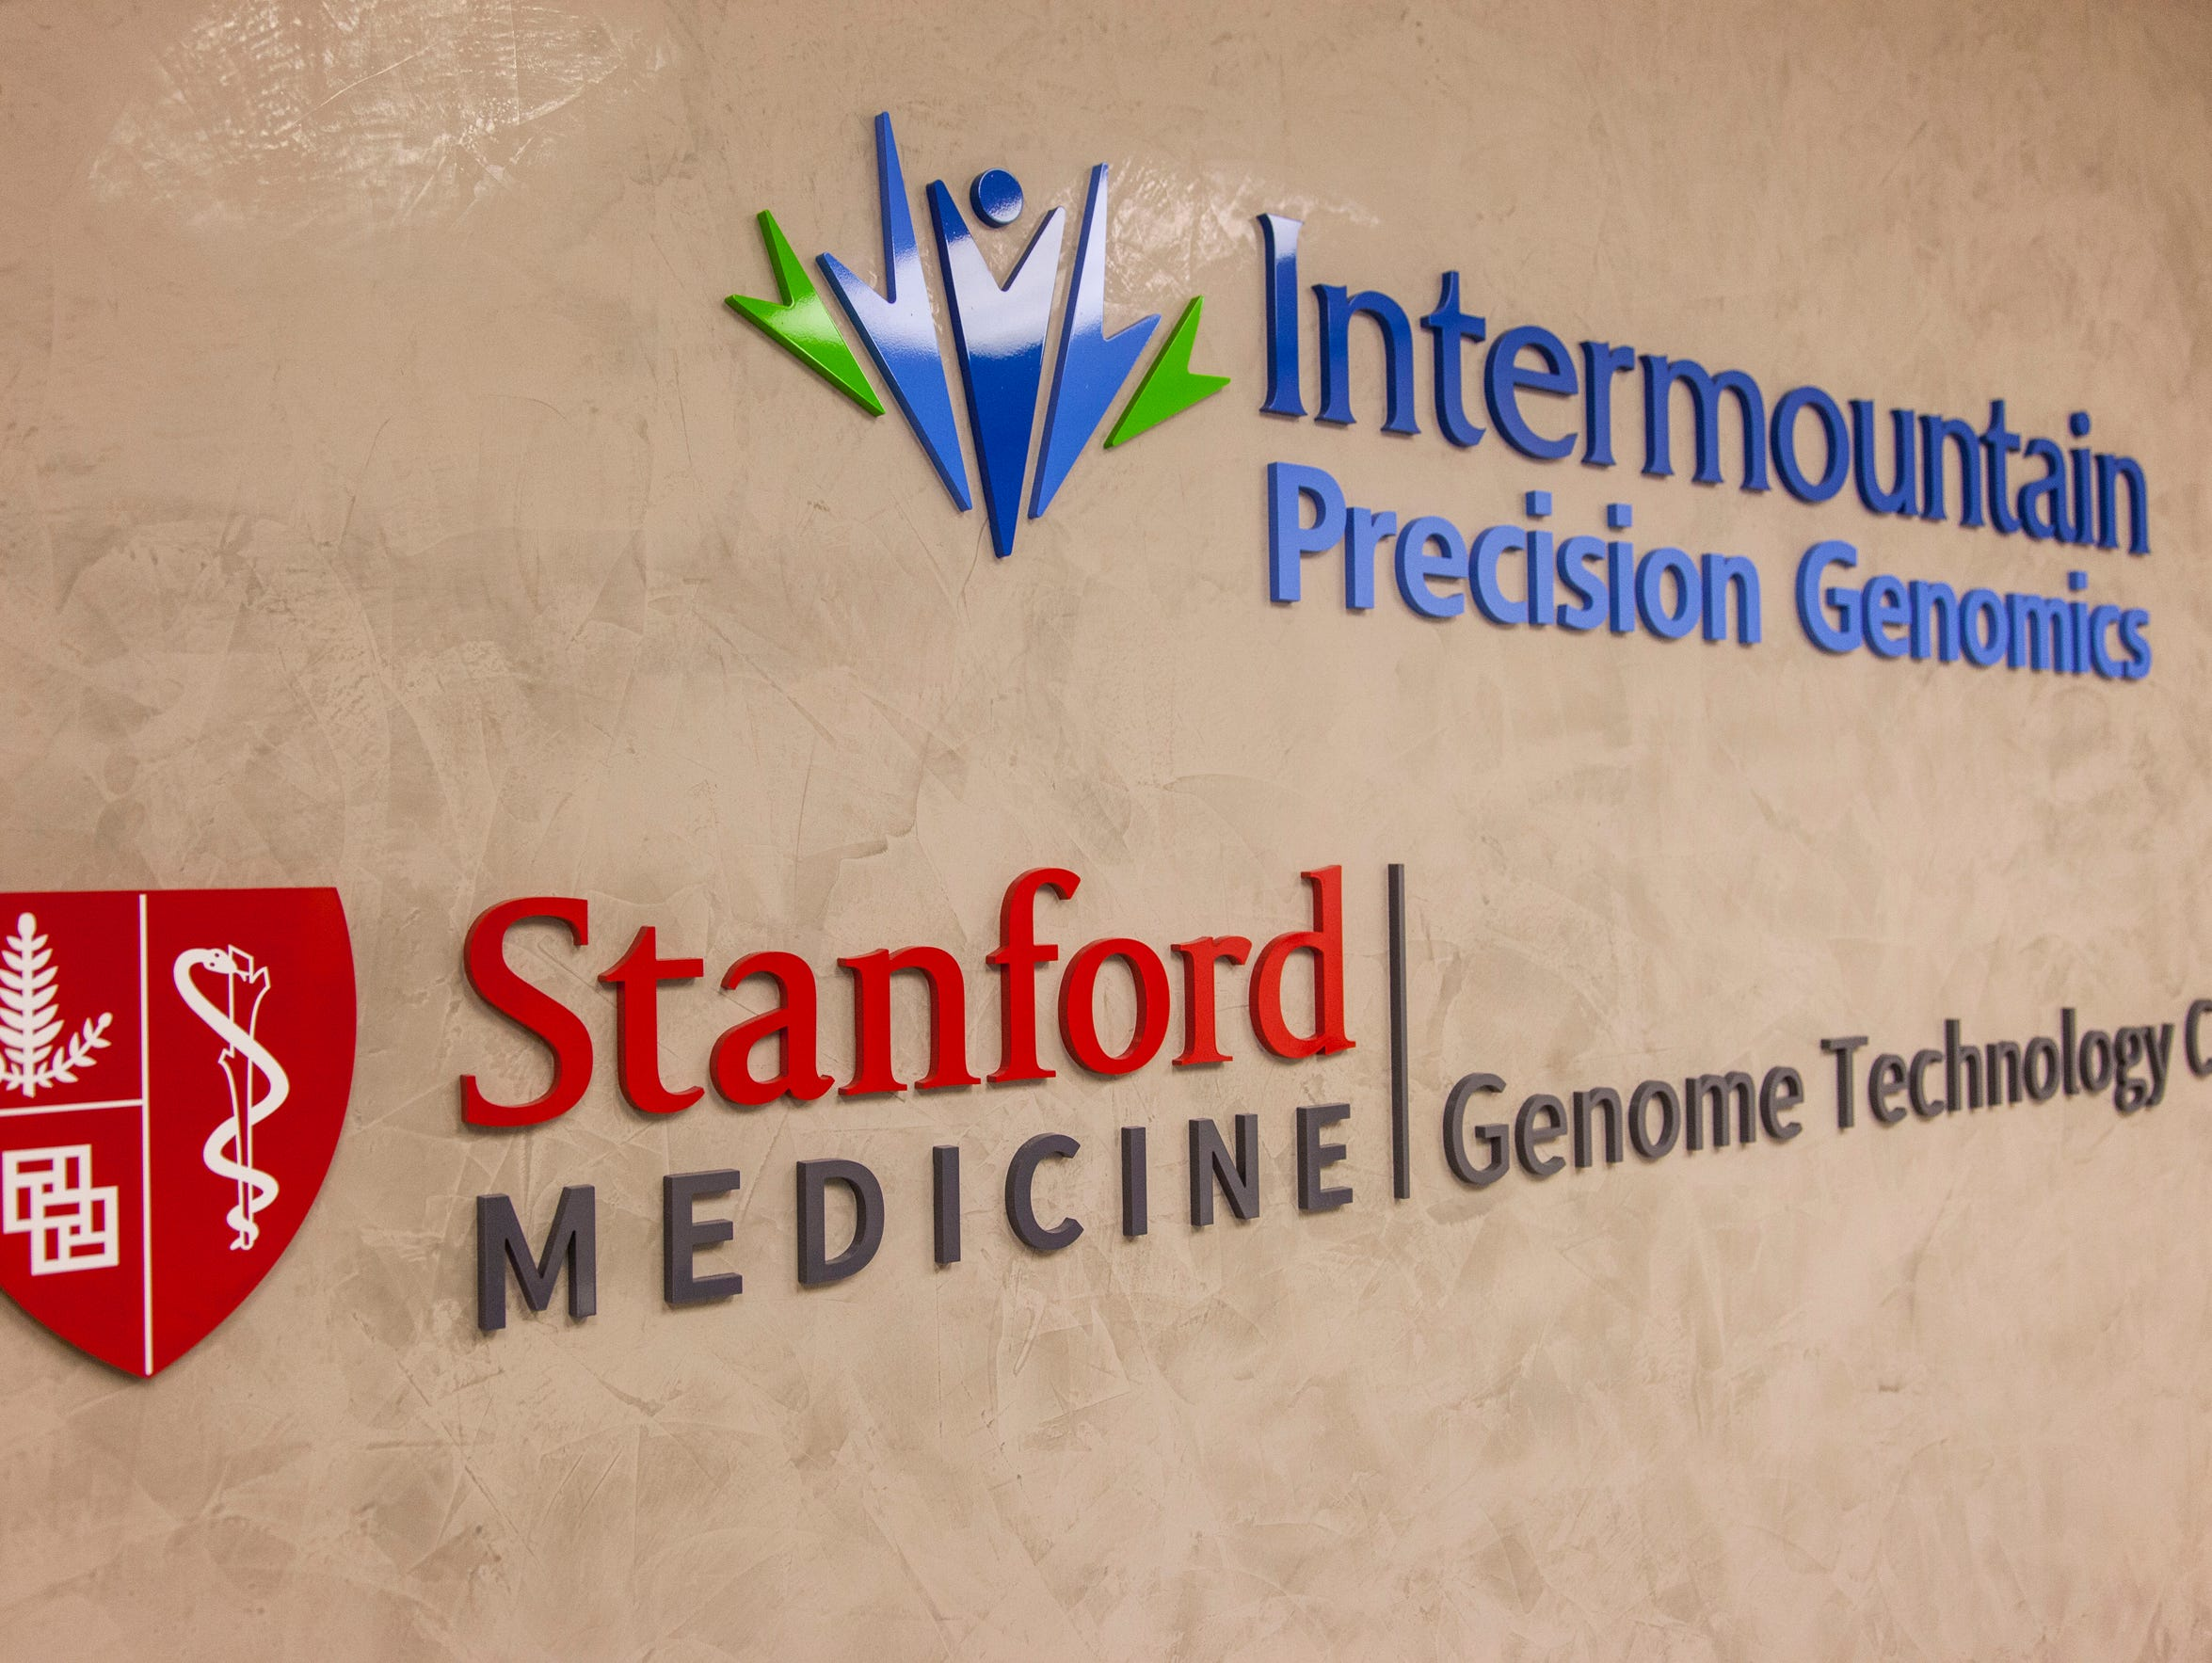 Intermountain Precision Genomics has partnered with